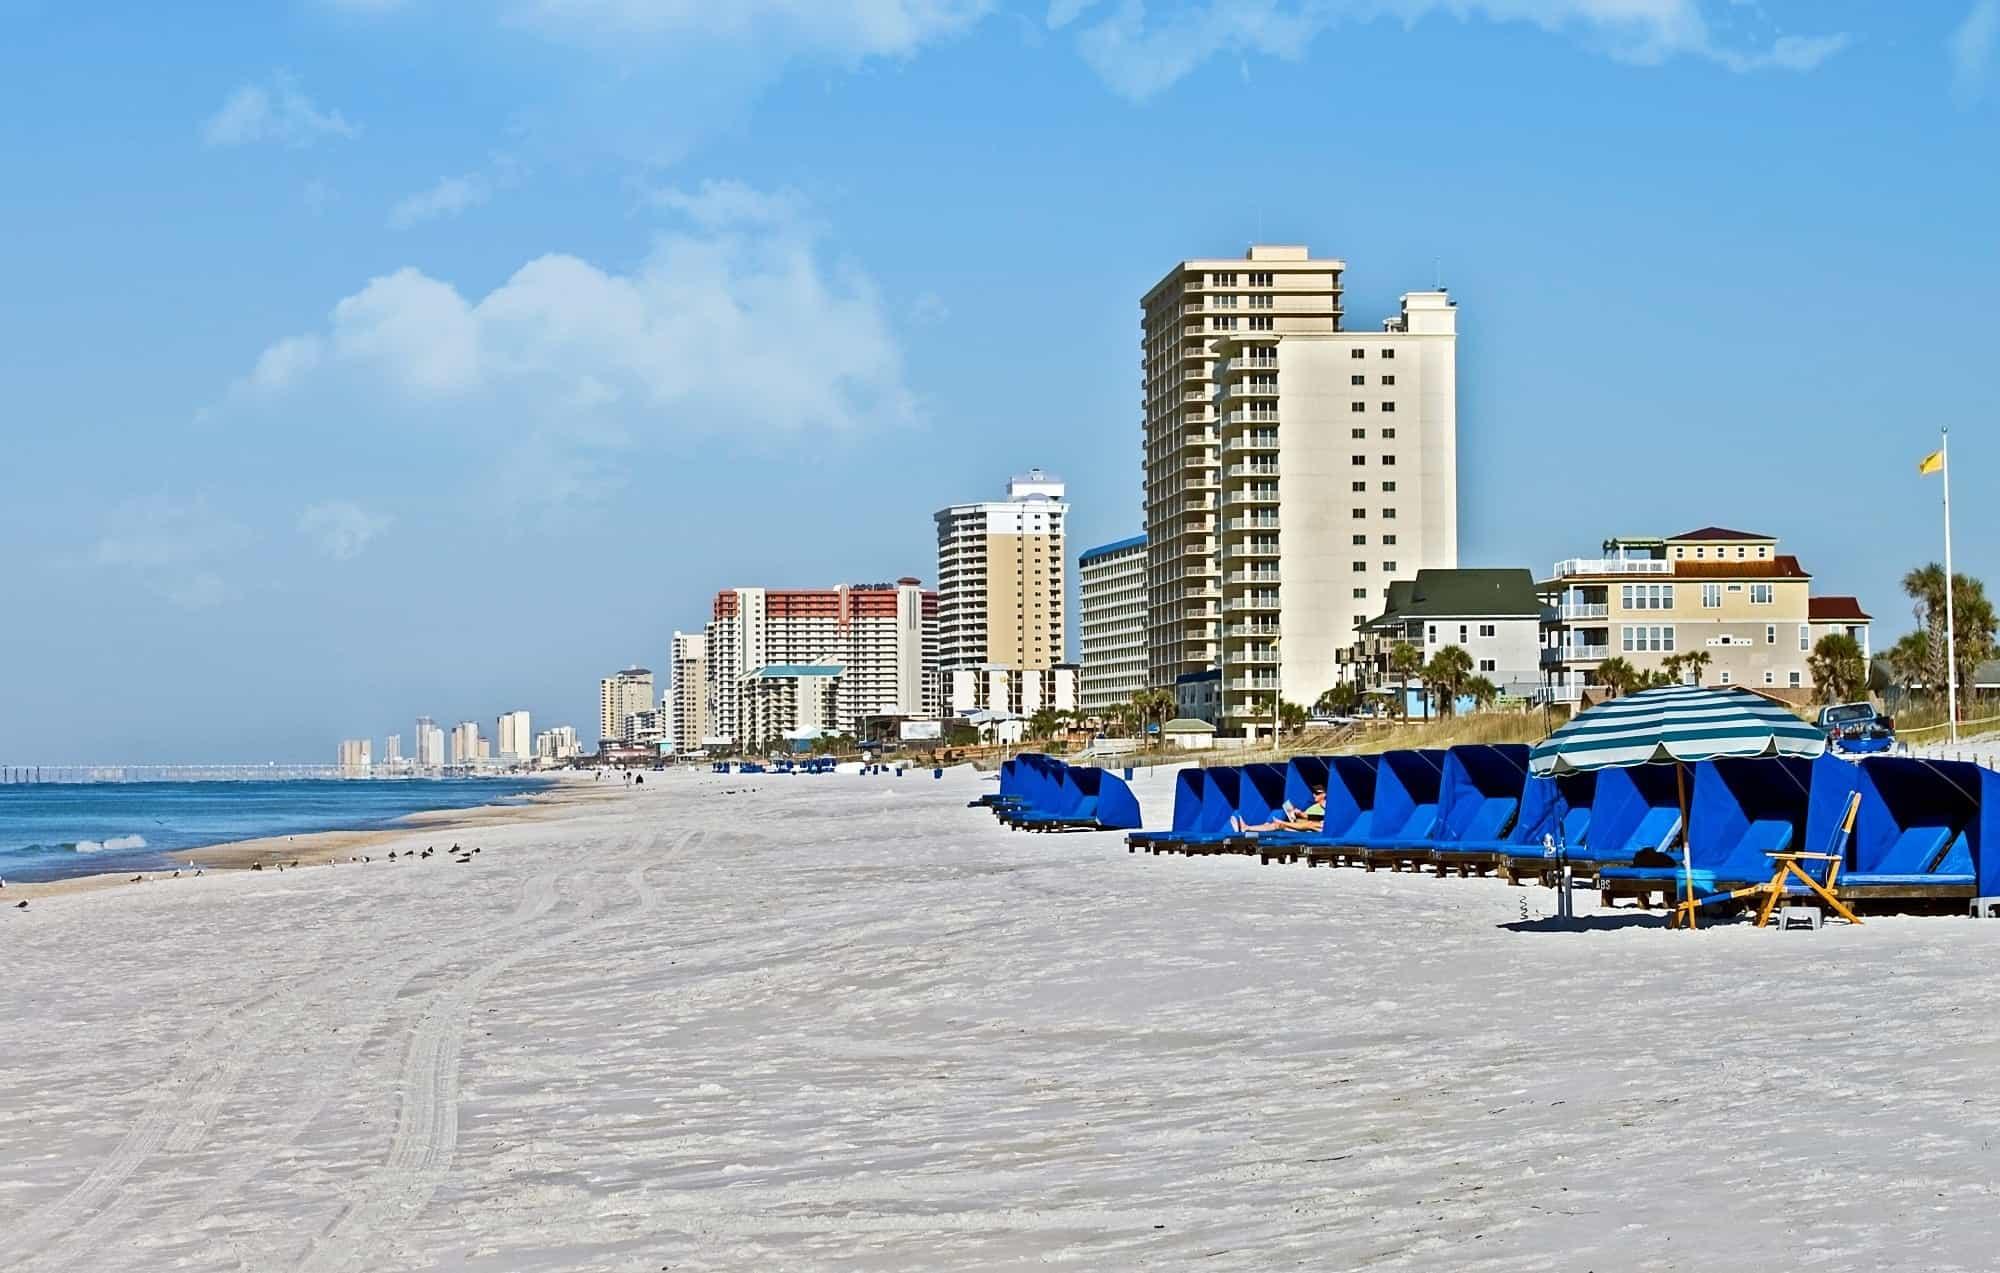 Panama City Beach: A Relaxing Family Vacation